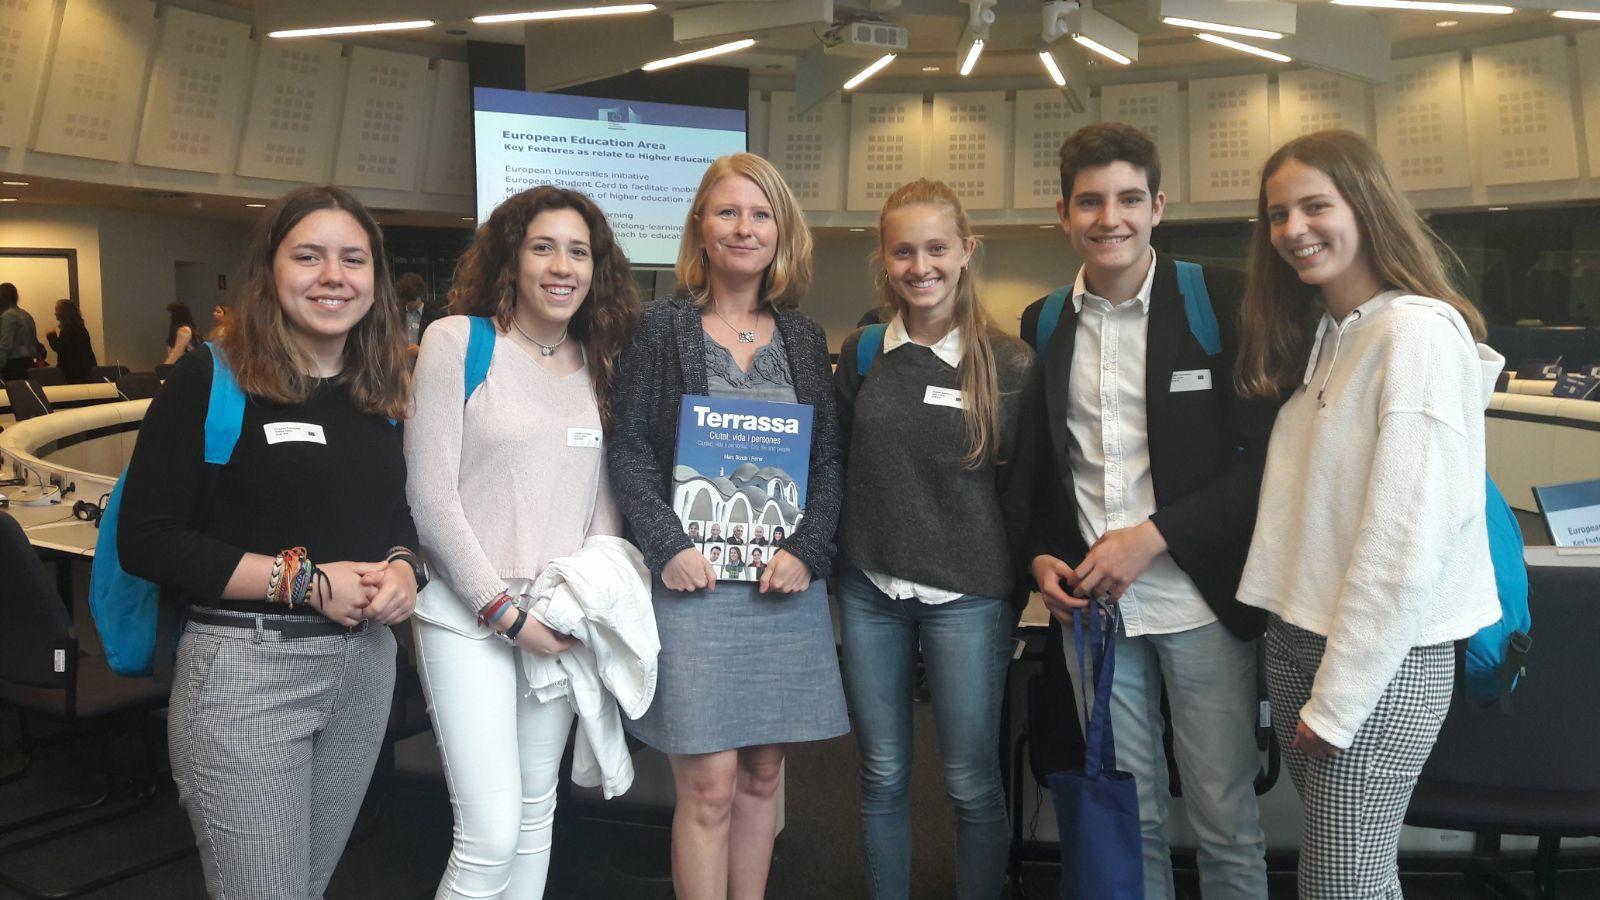 Meeting Holanda Maig 2018 Erasmus+